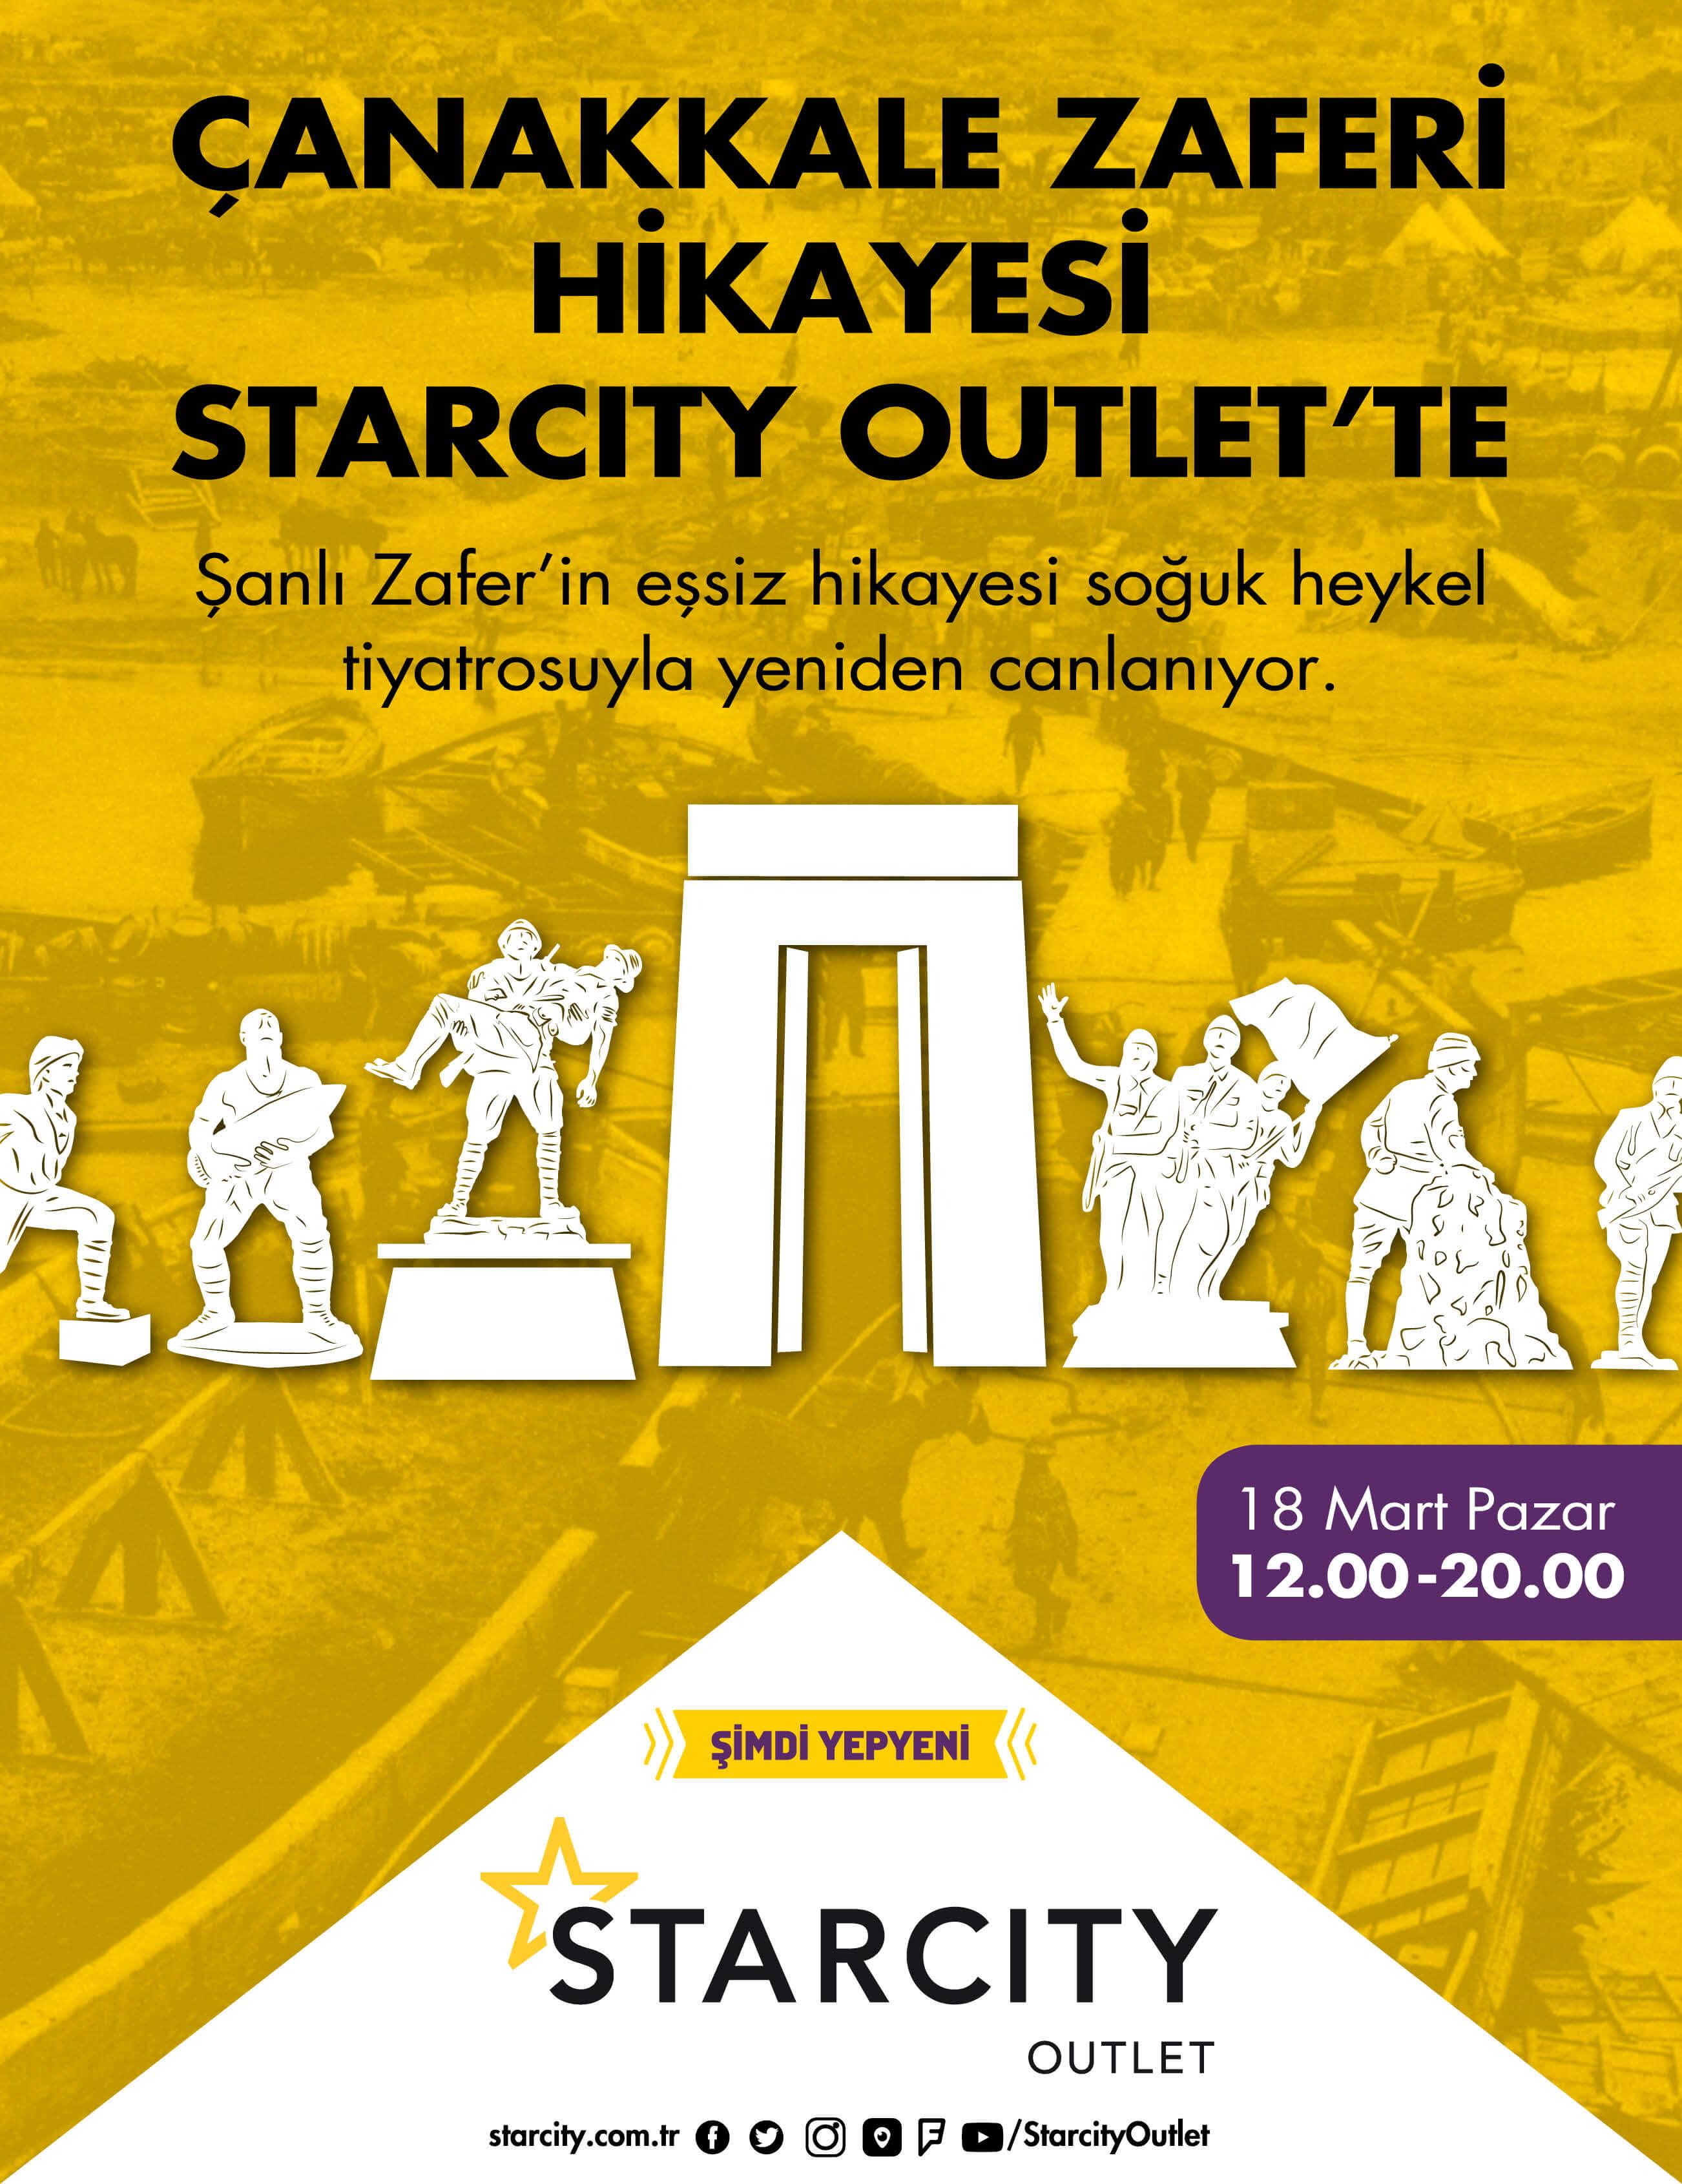 ÇANAKKALE ZAFERİ HİKAYESİ STARCITY OUTLET'TE